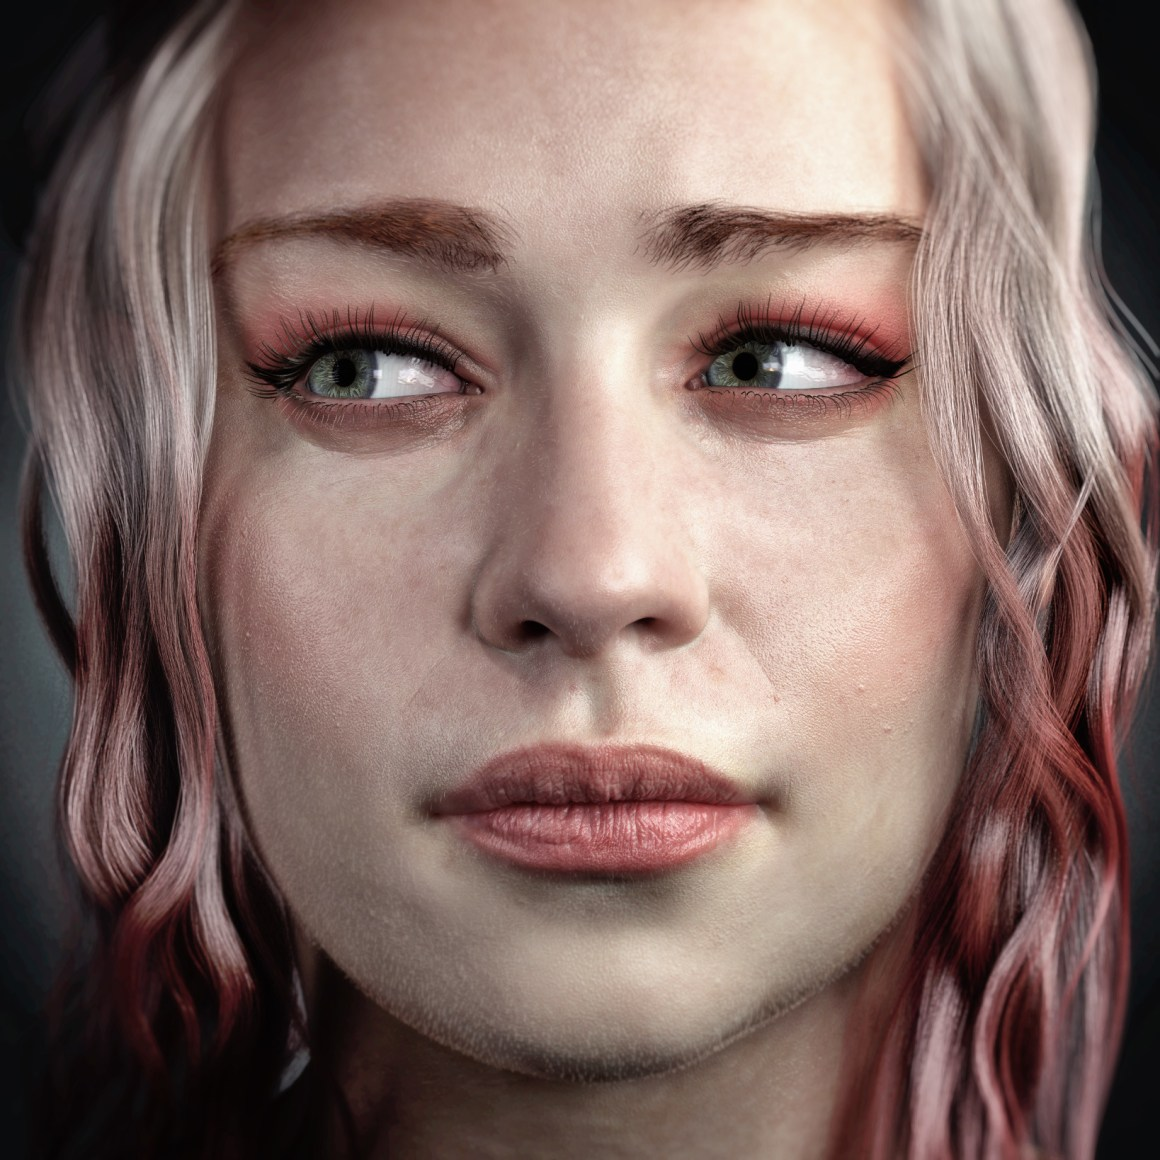 Pink female portrait by Vladimir Minguillo